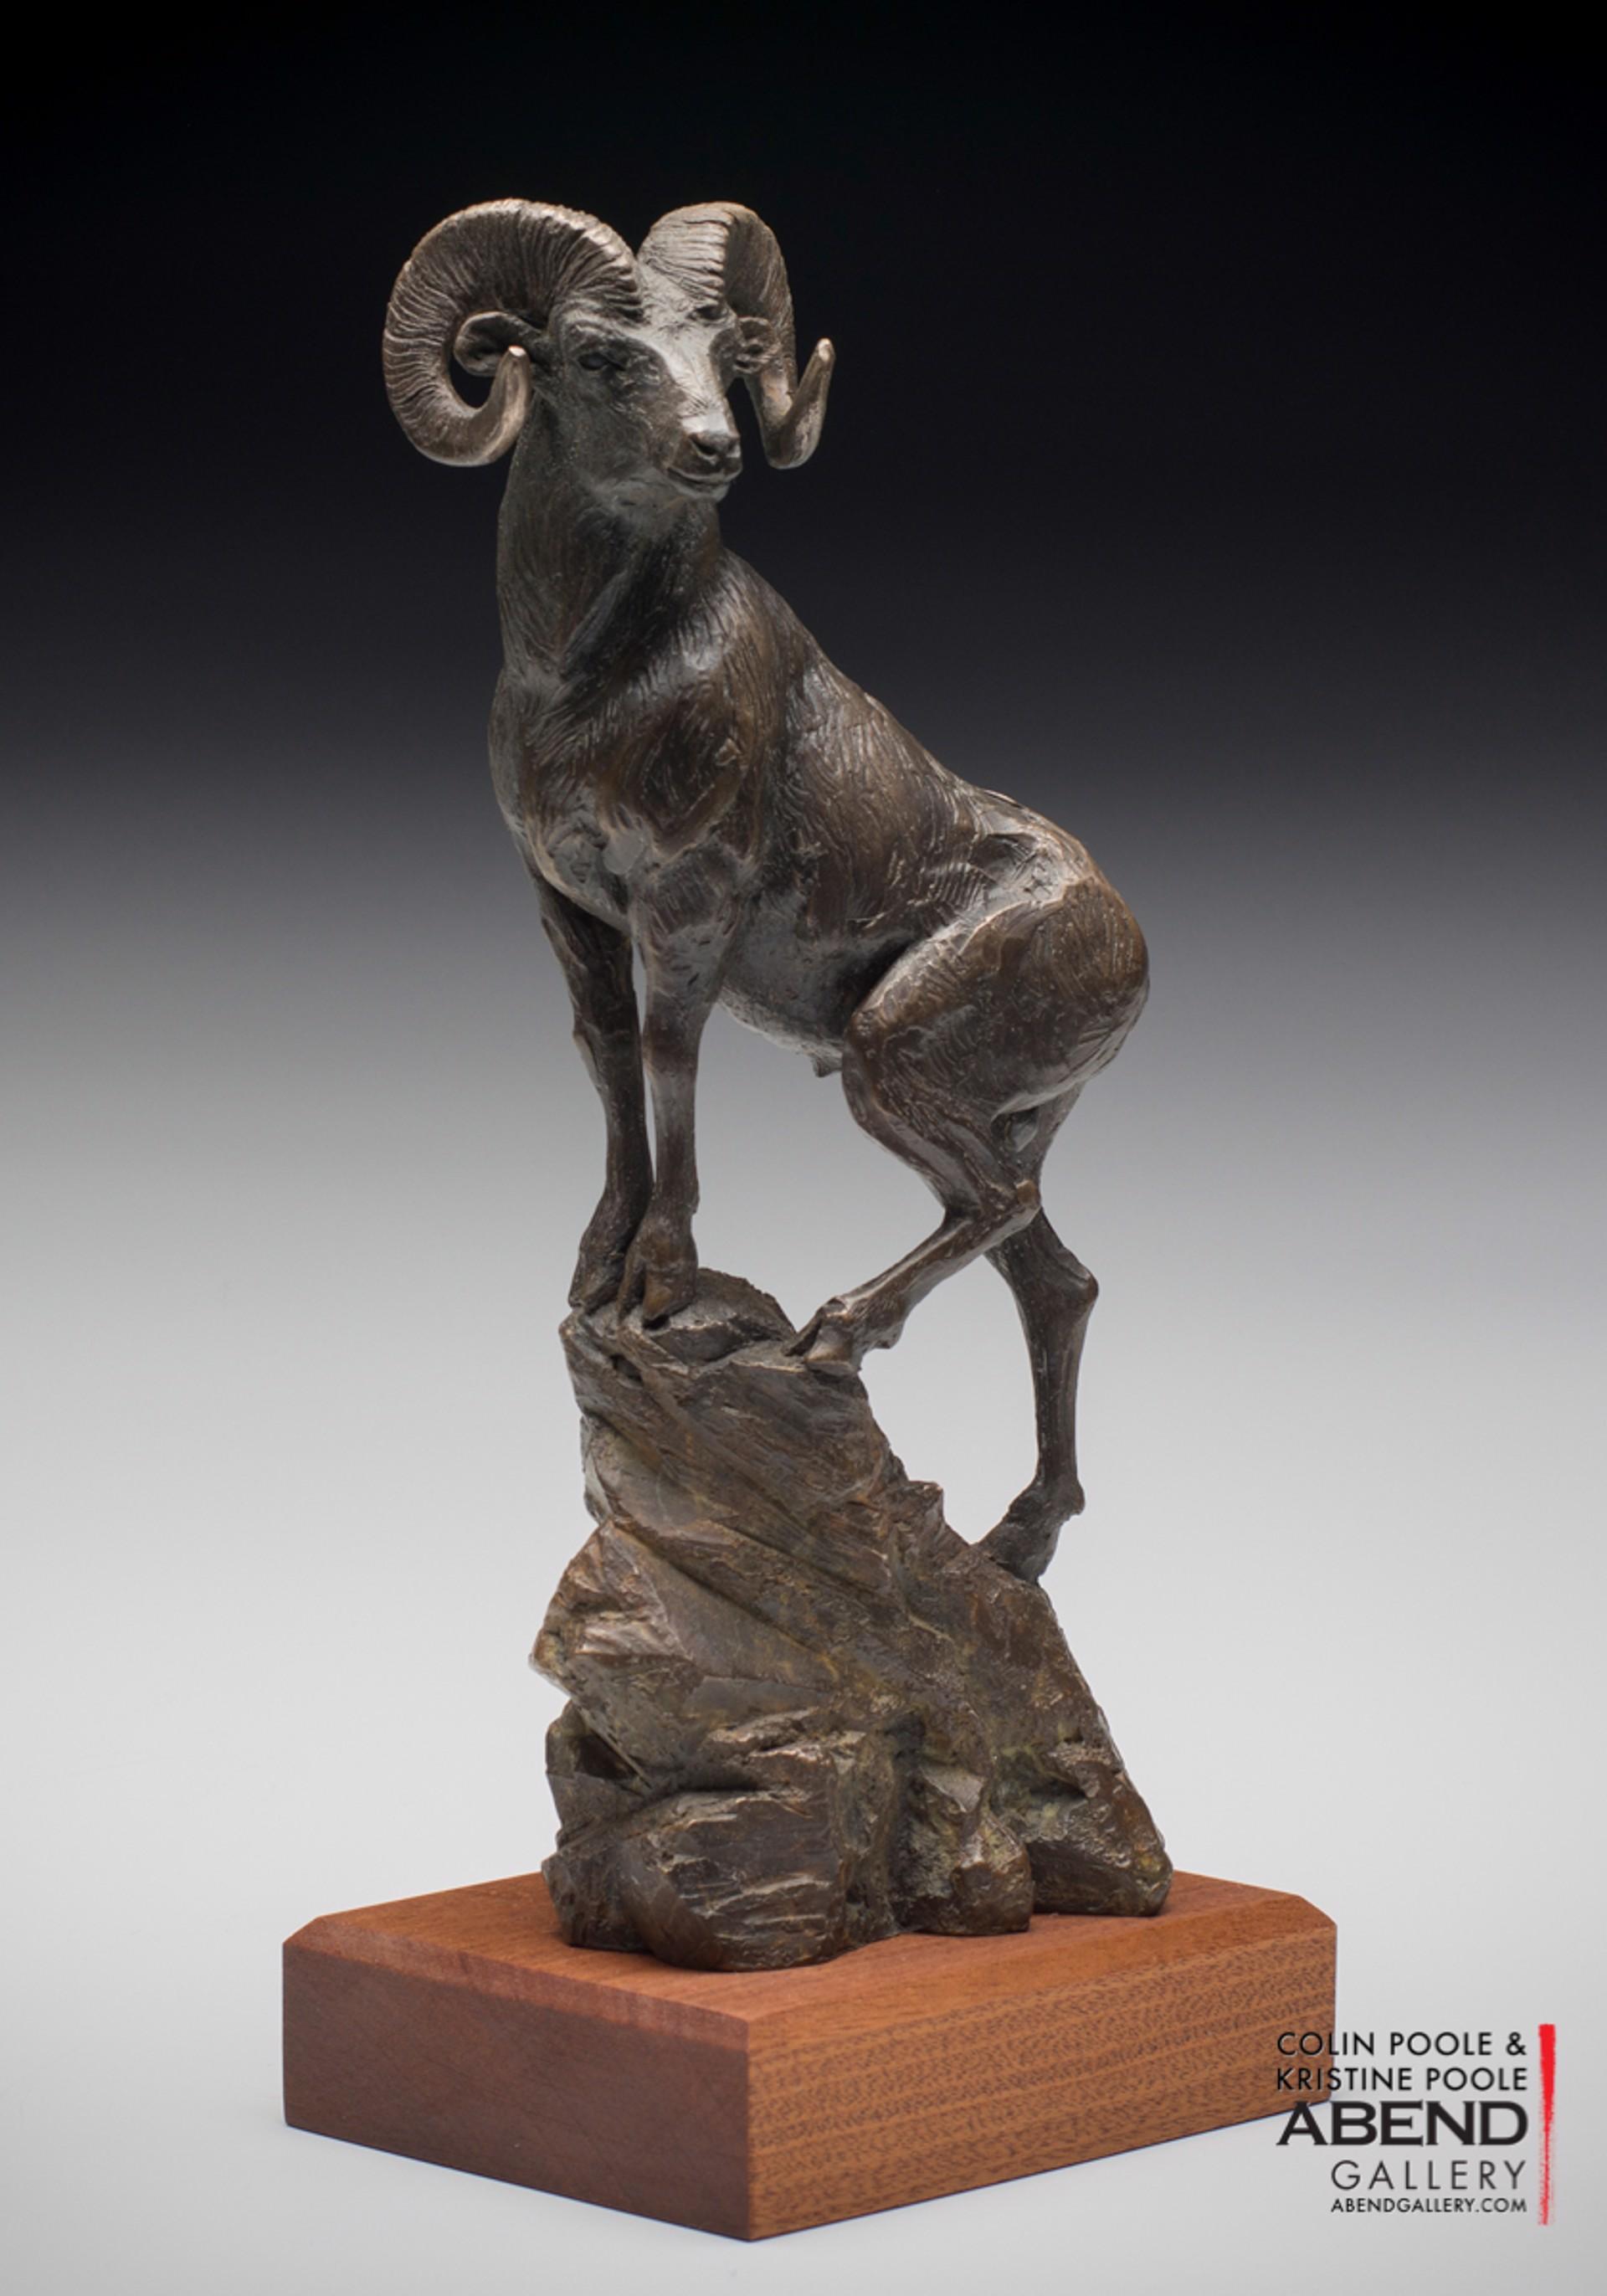 Bighorn Sheep by Colin & Kristine Poole